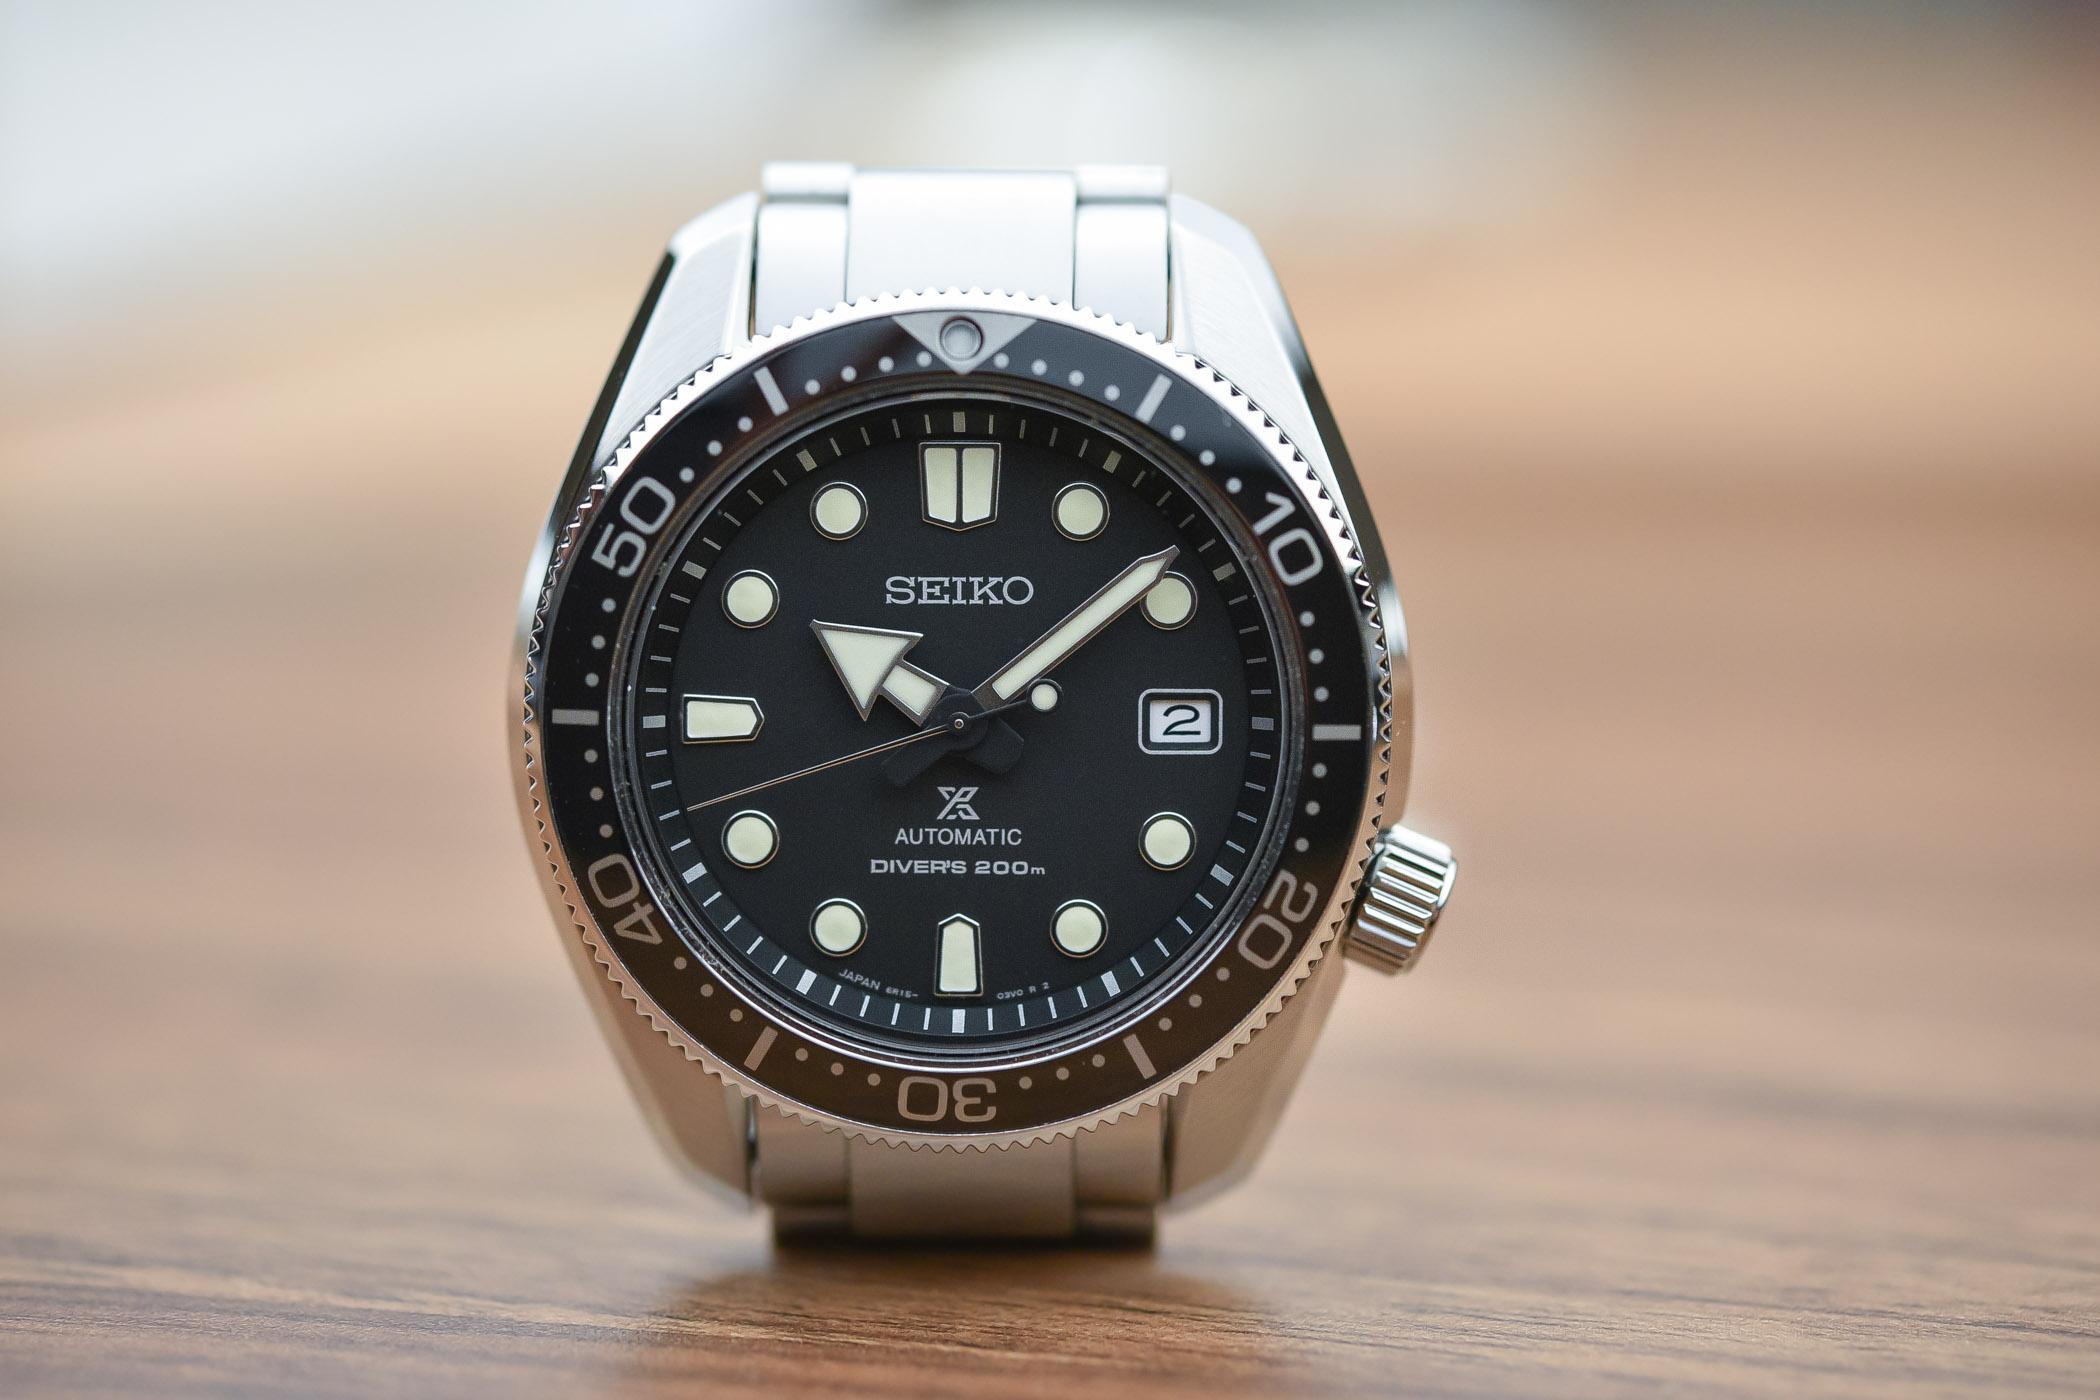 Seiko Prospex Diver 200m SPB077 - Baselworld 2018